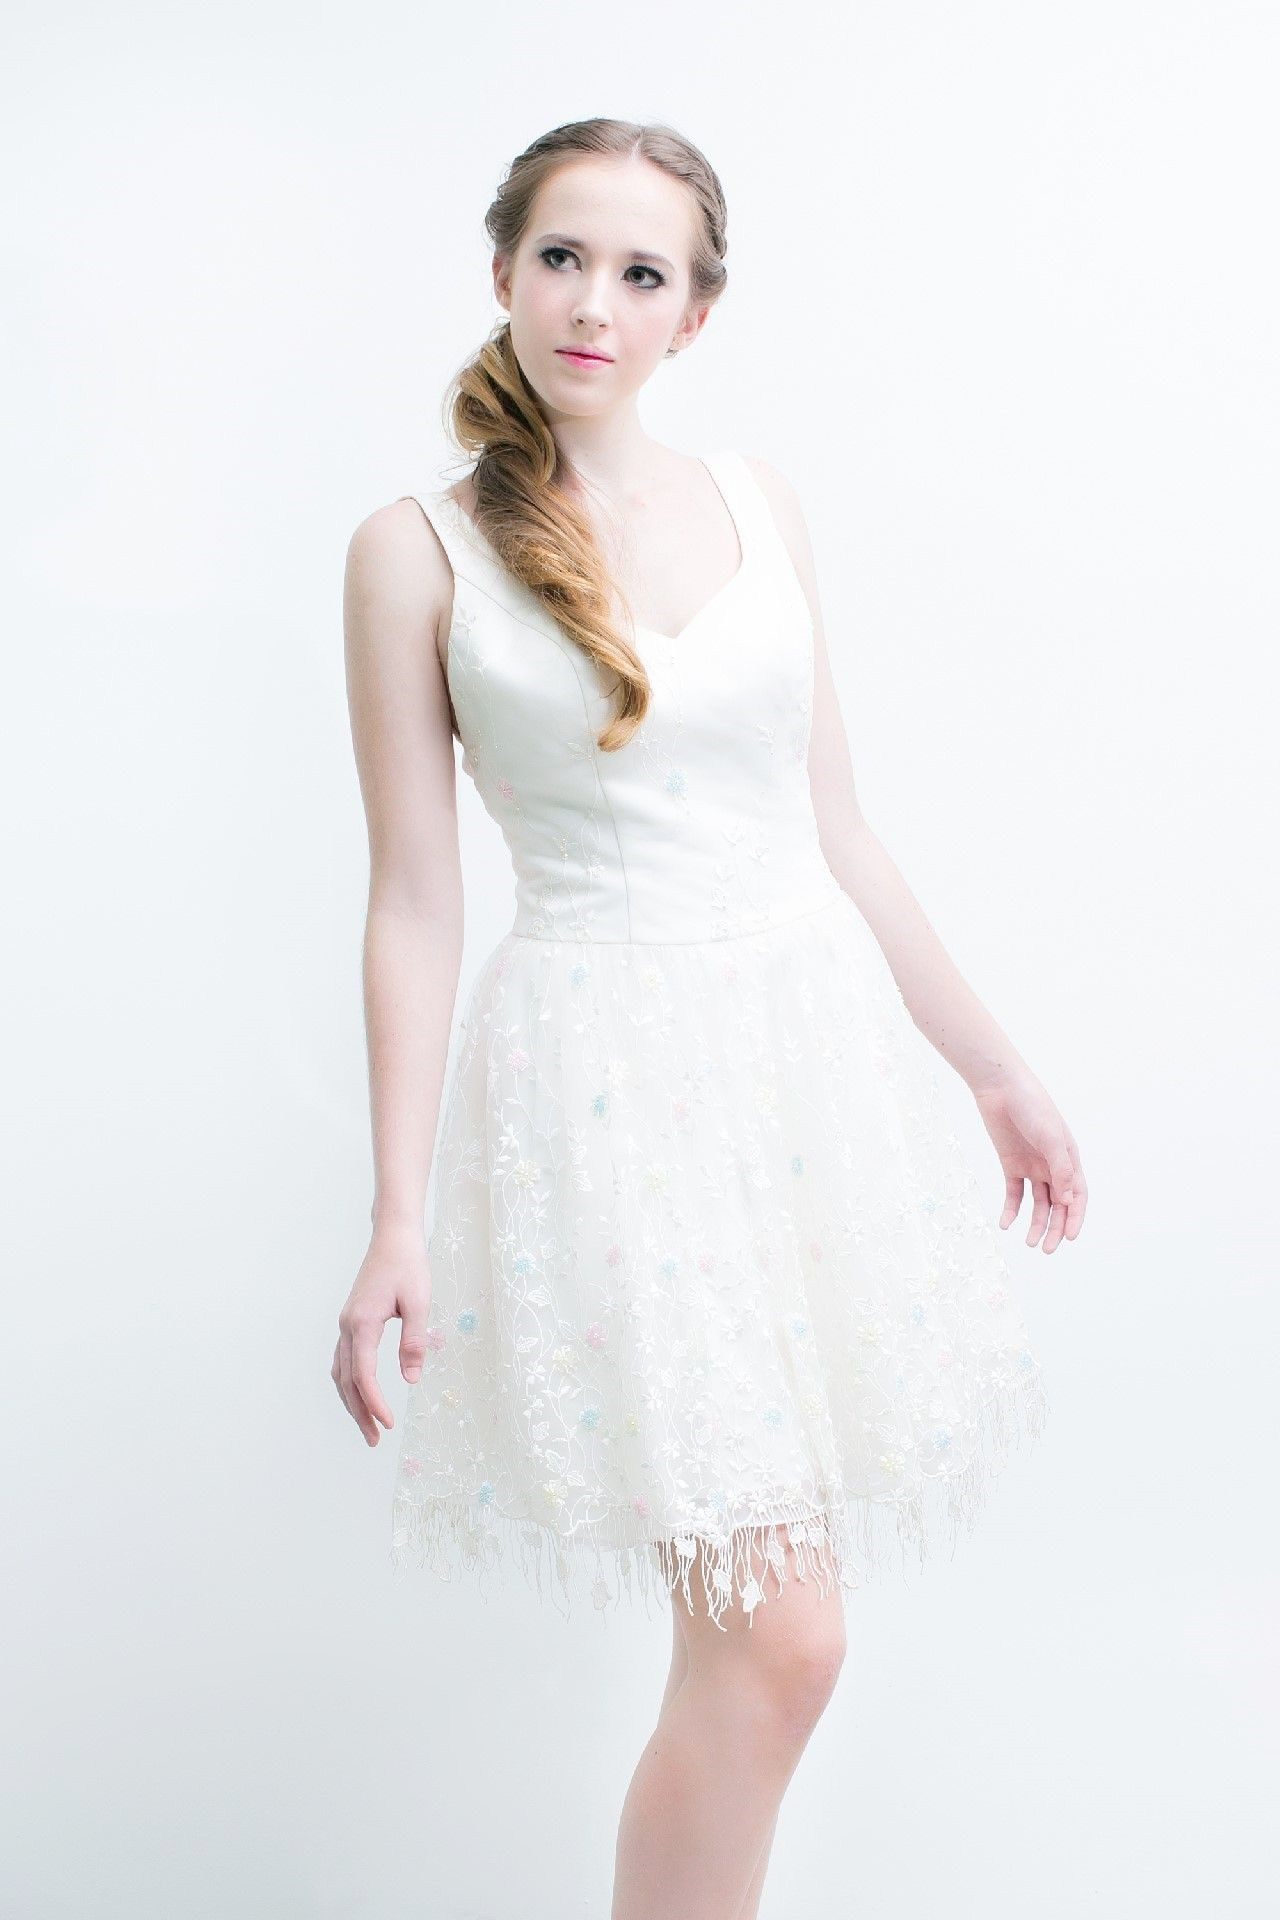 Wedding dresses rental  Dear bridetobe the new designmade cute White Strapless Short